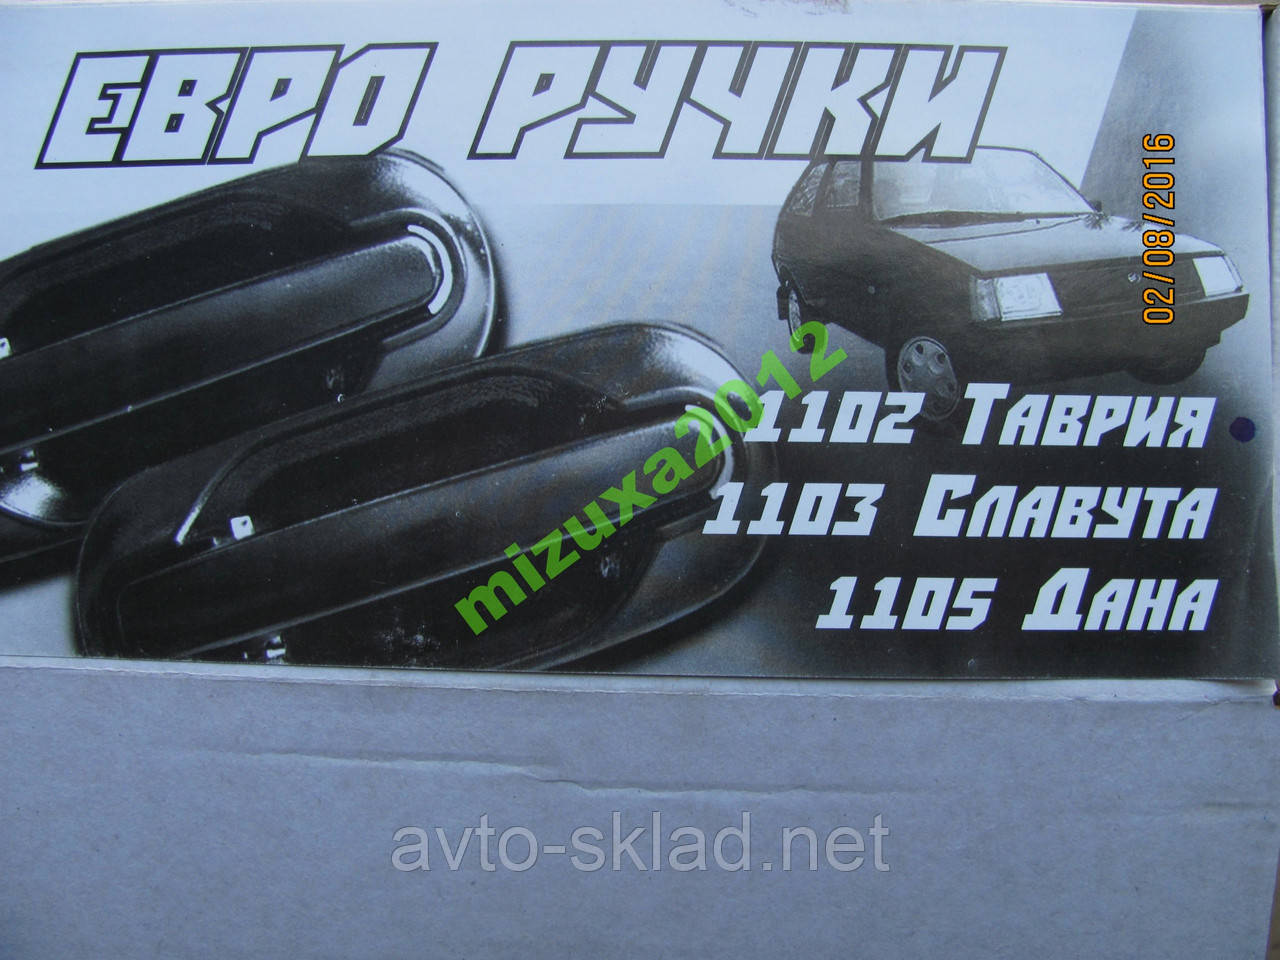 Ручки двери ЗАЗ 1102 1103 11105 Славута, евро